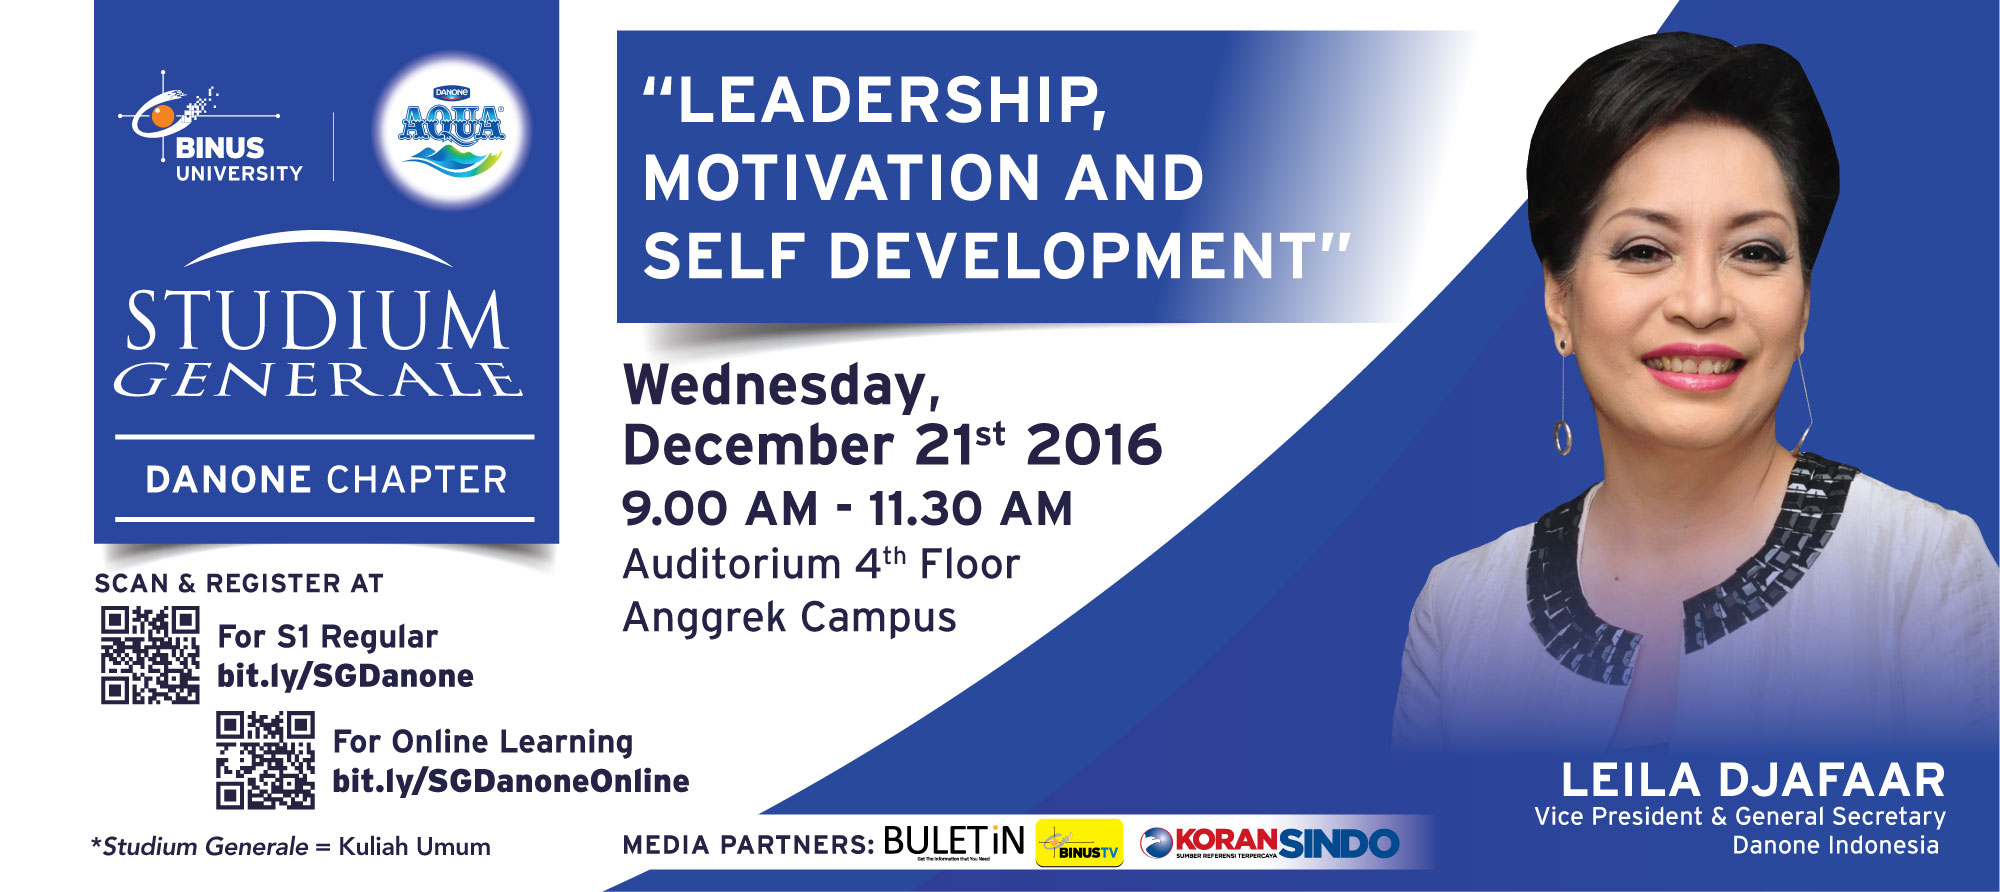 leaders as motivators